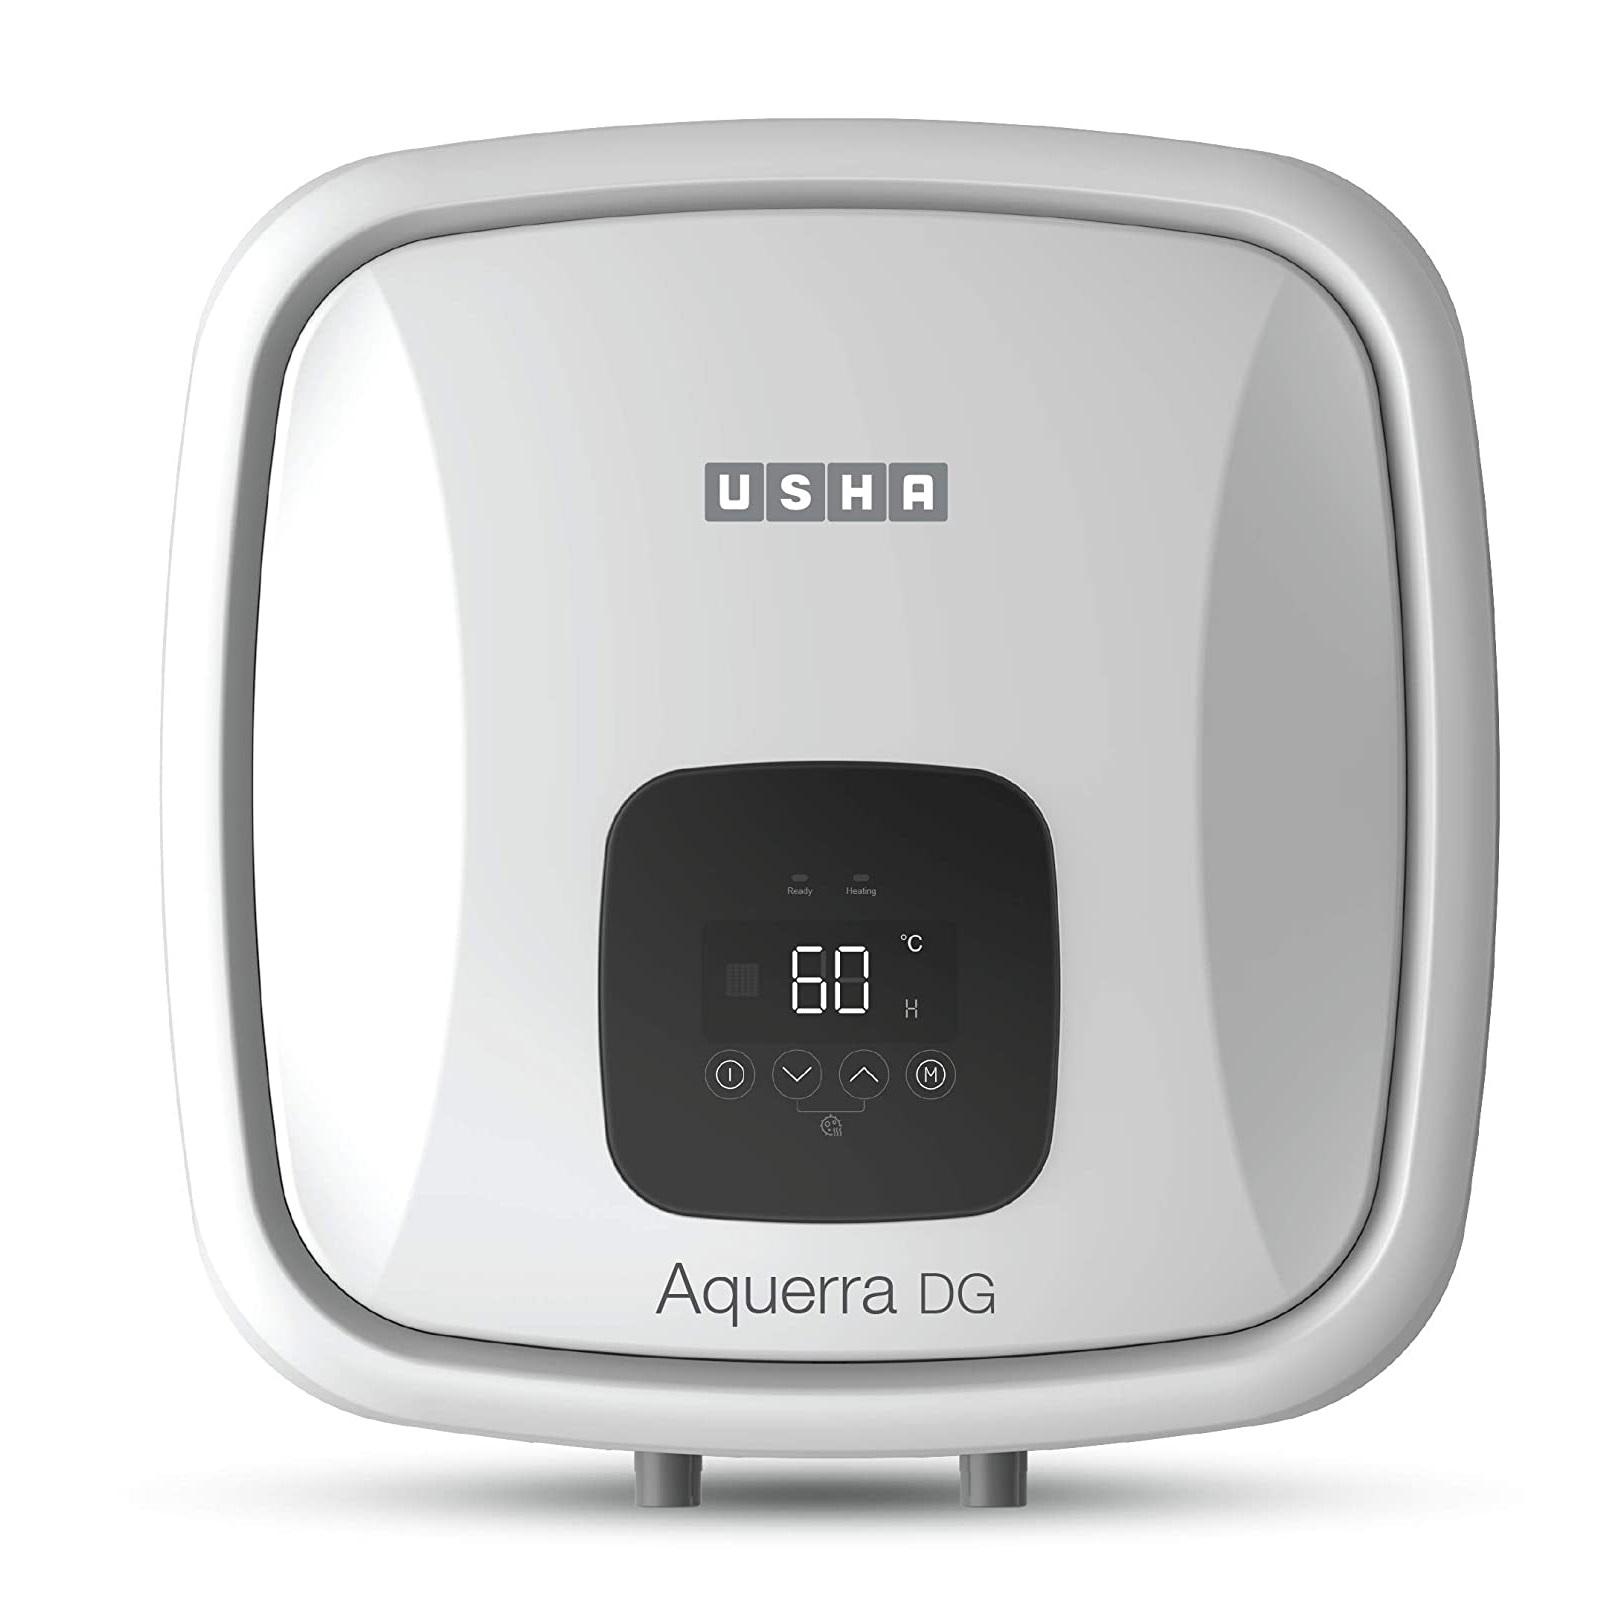 Usha Aquerra DG 15 Litre Storage Water Heater